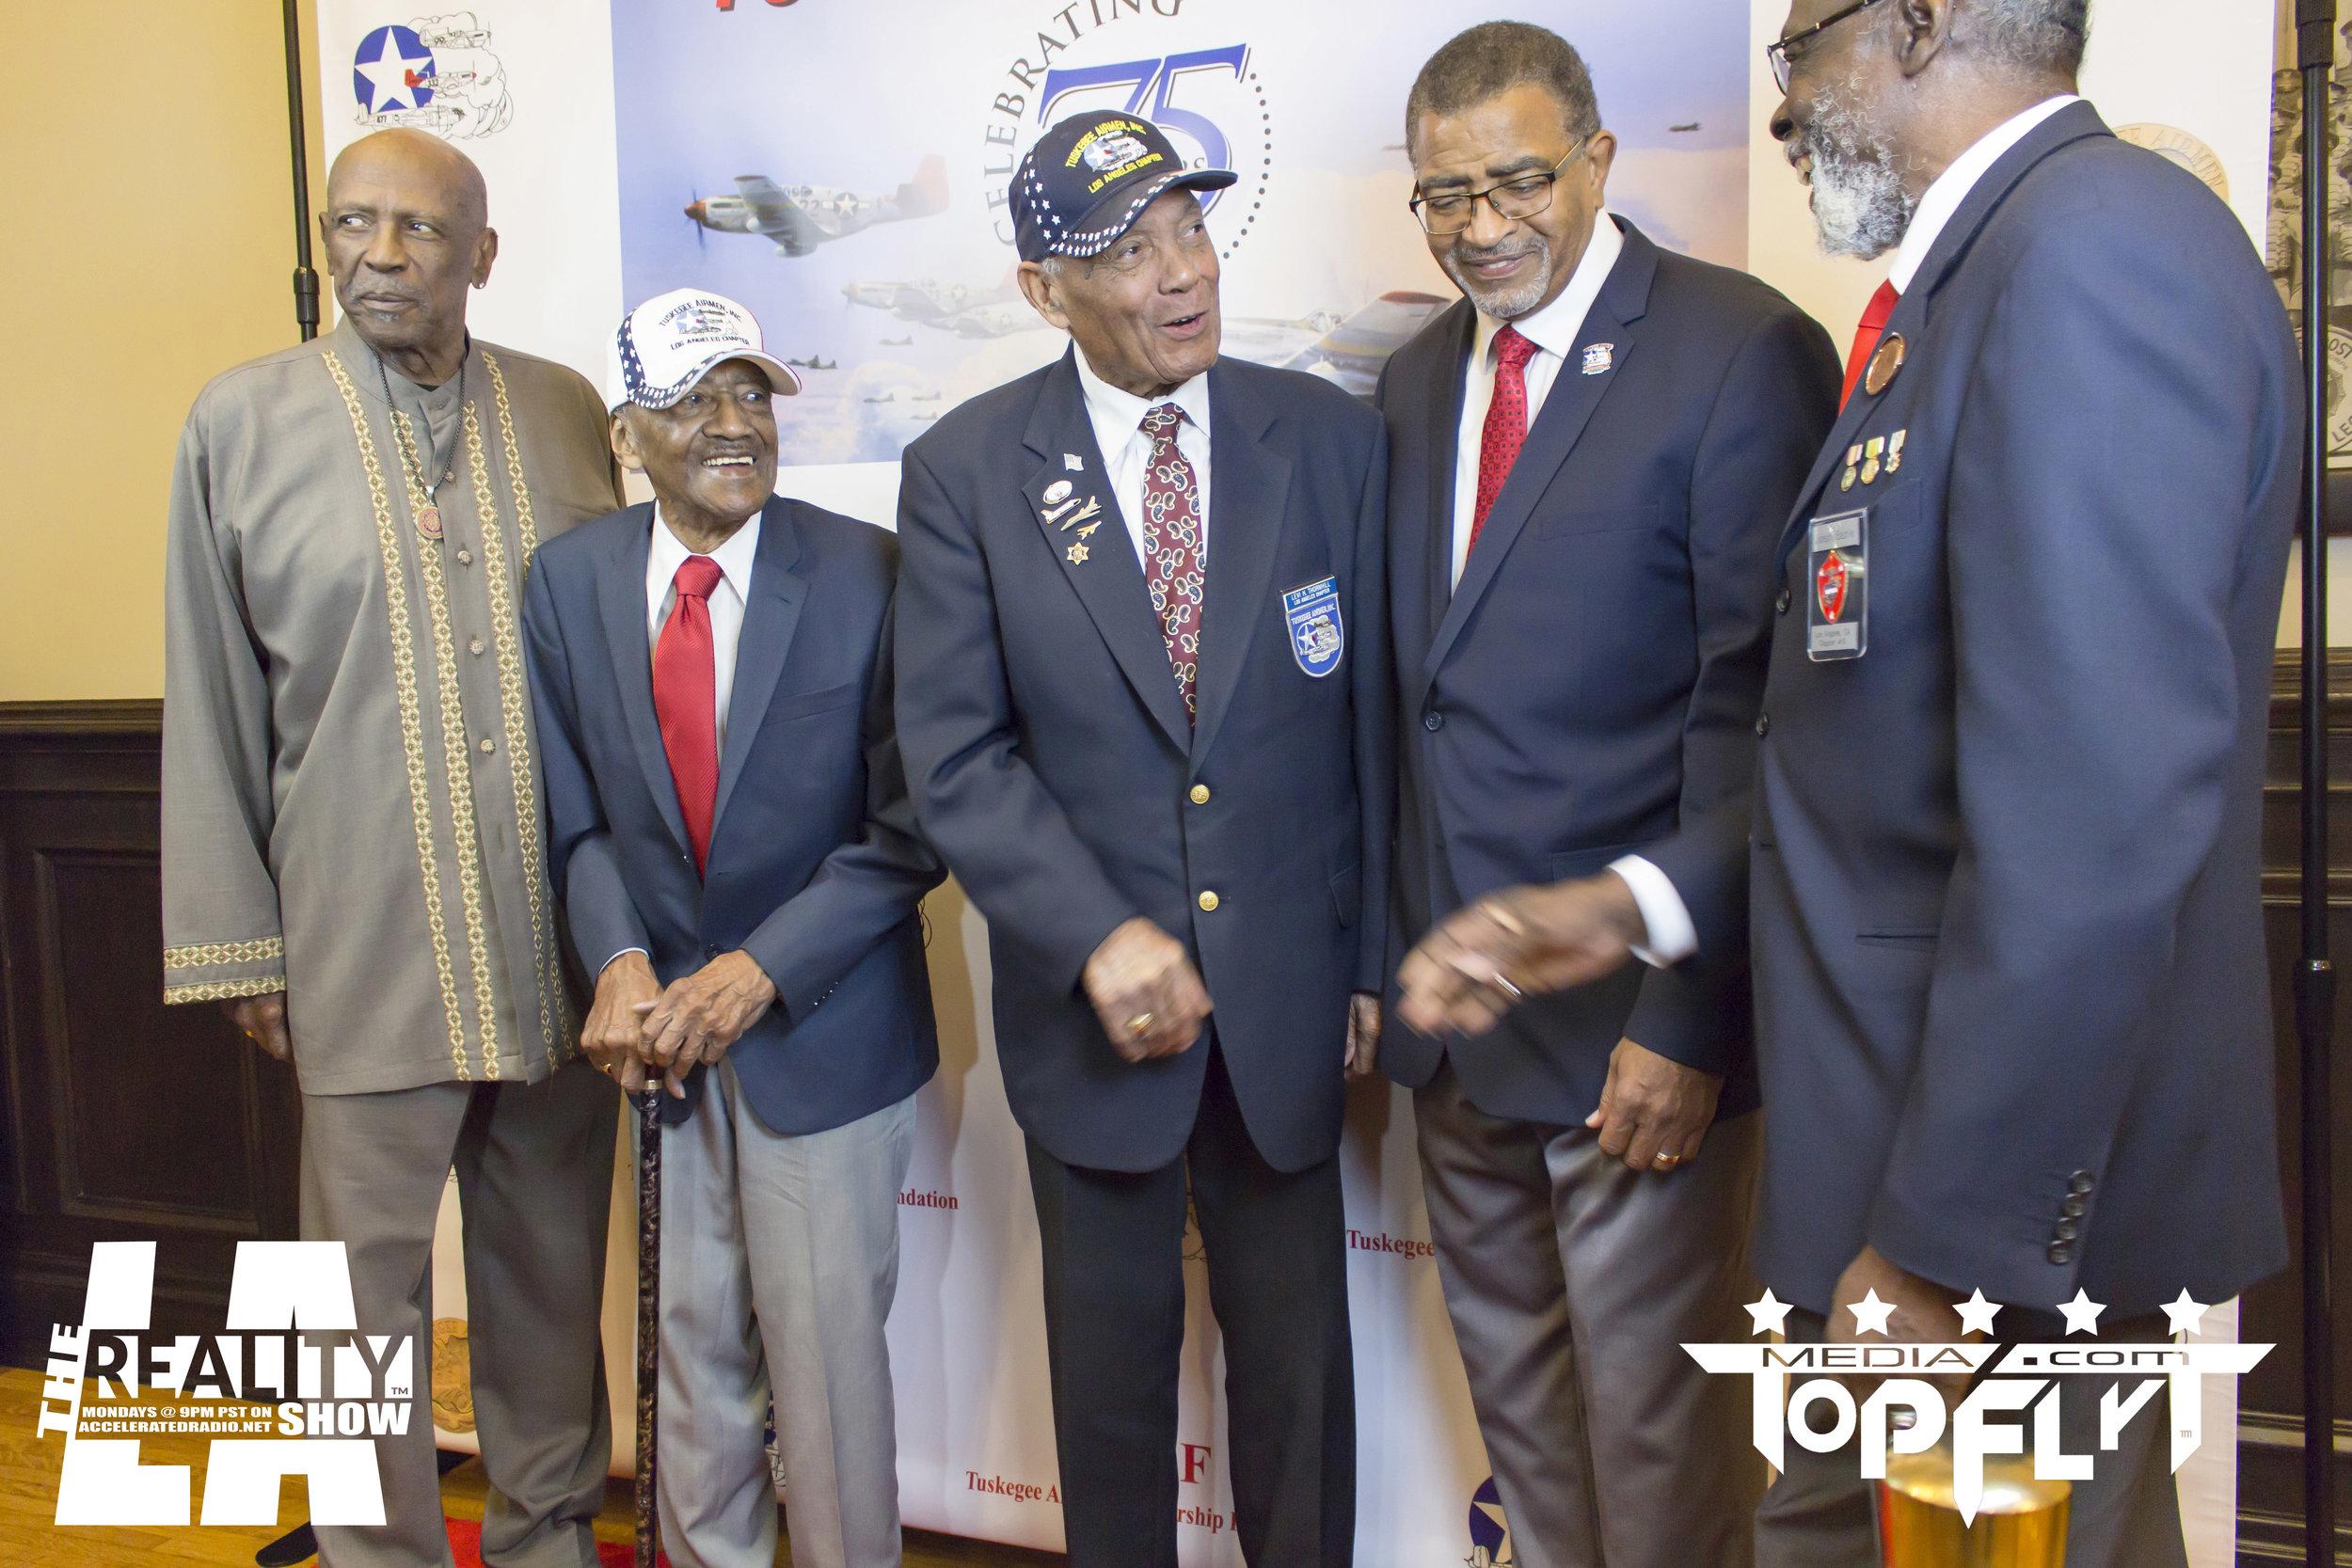 The Reality Show LA - Tuskegee Airmen 75th Anniversary VIP Reception_162.jpg